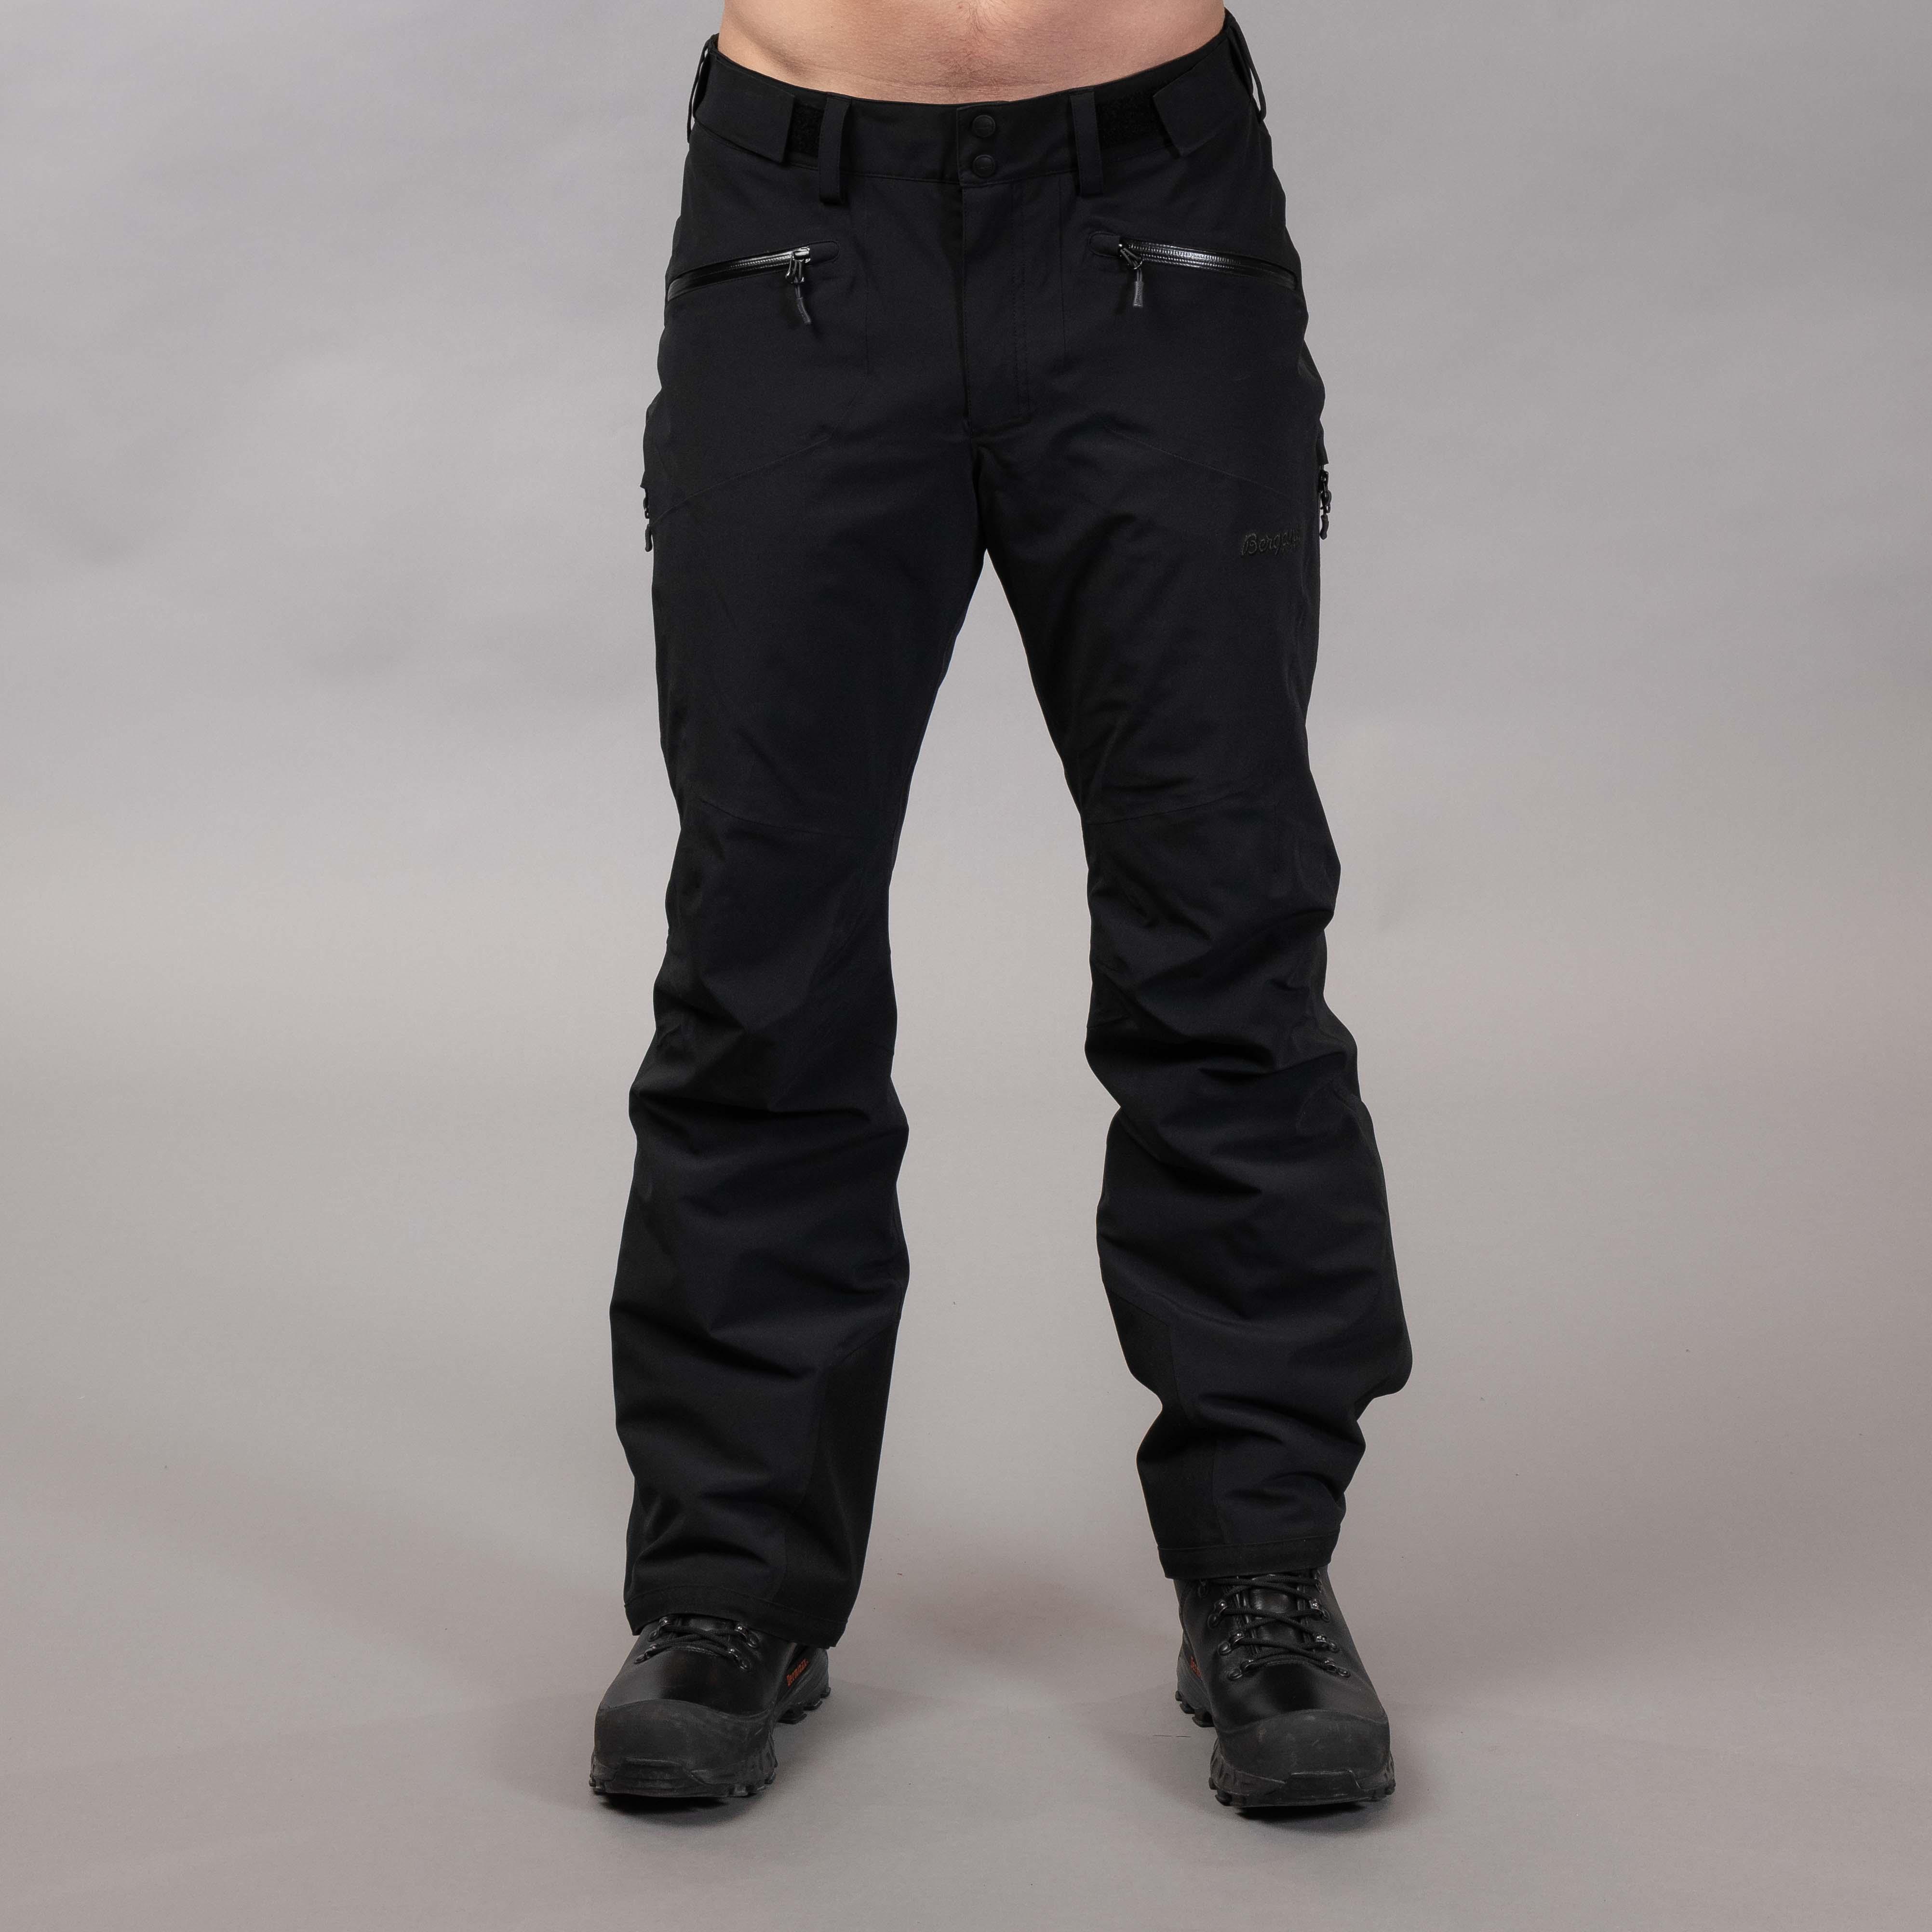 Oppdal Pants